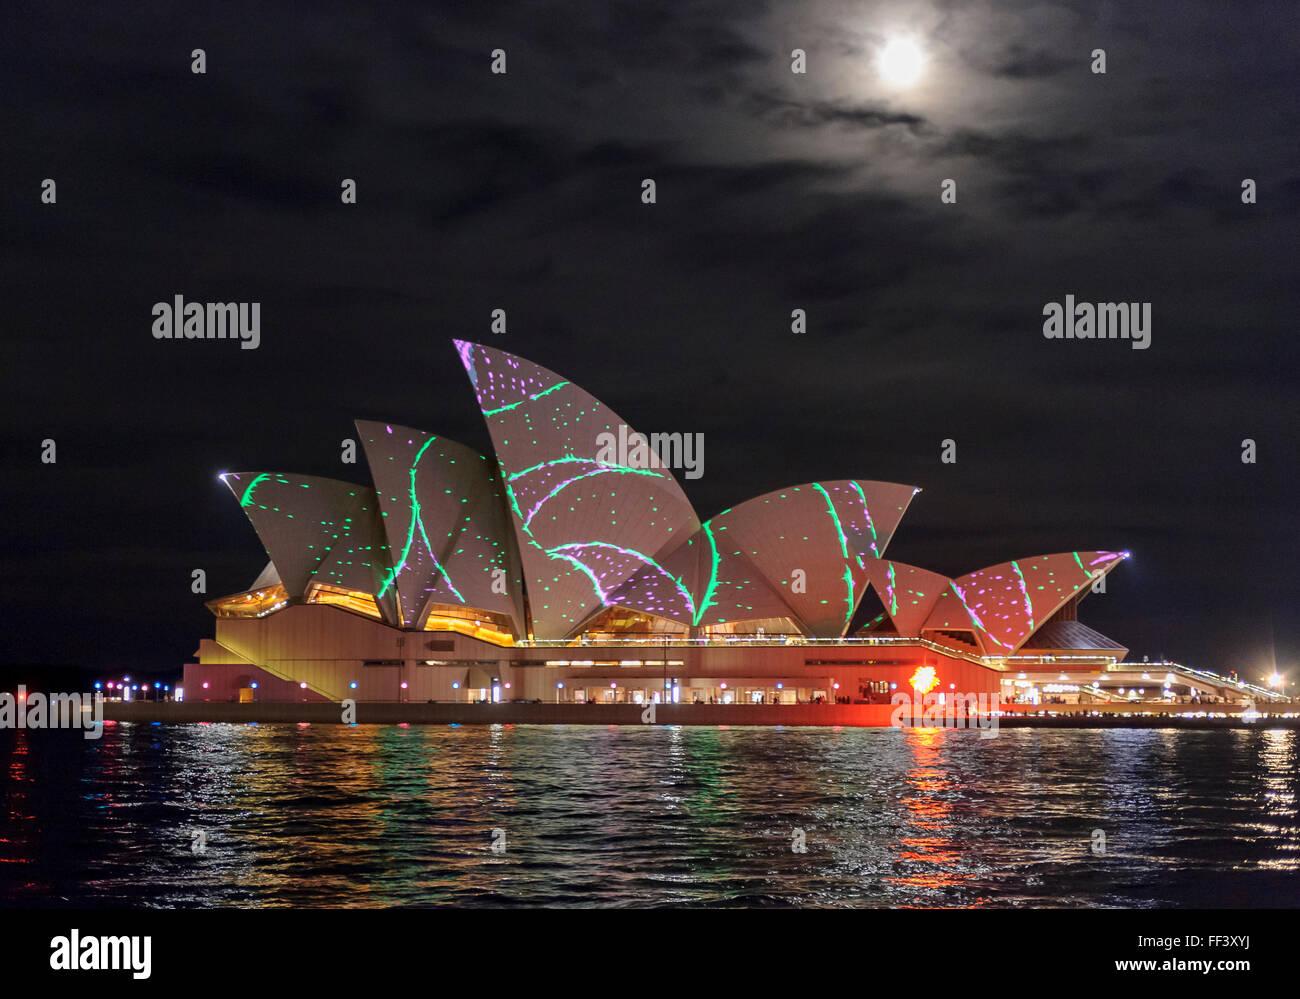 Sydney Opera House, Sydney Vivid Festival,Circular Quay, Sydney, New South Wales, Australia. - Stock Image